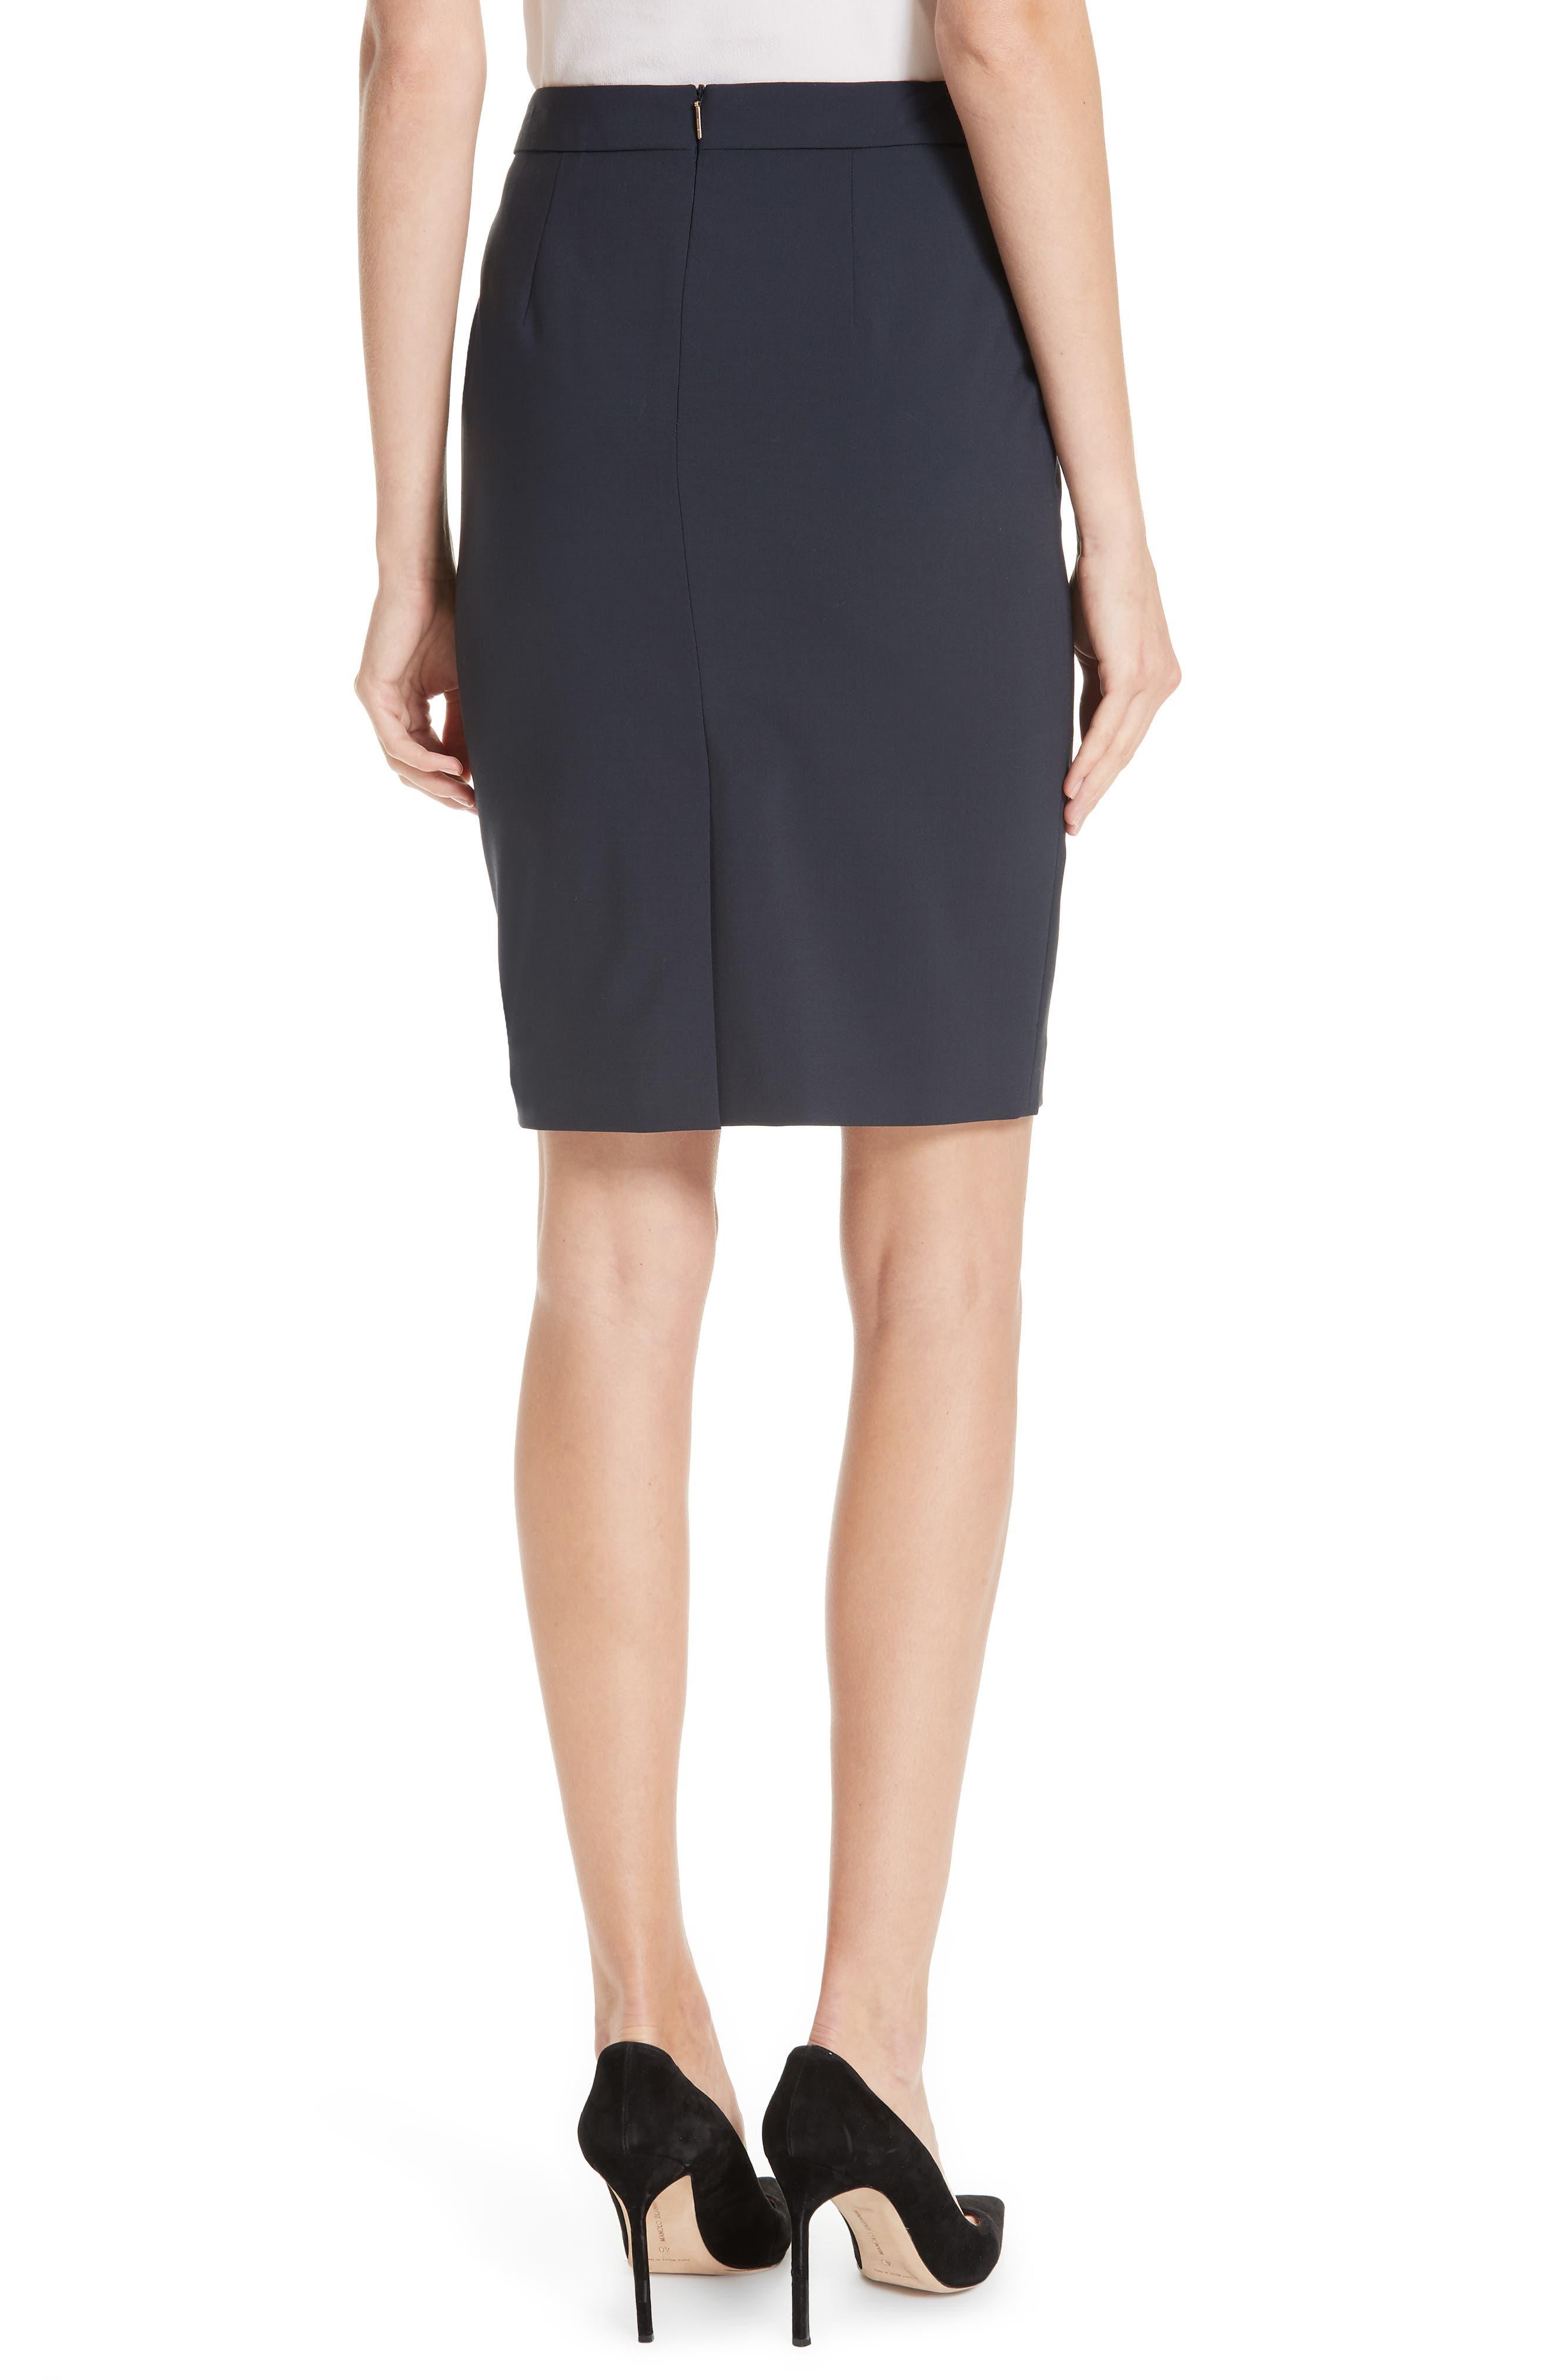 BOSS, Vilea Tropical Stretch Wool Pencil Skirt, Alternate thumbnail 2, color, NAVY